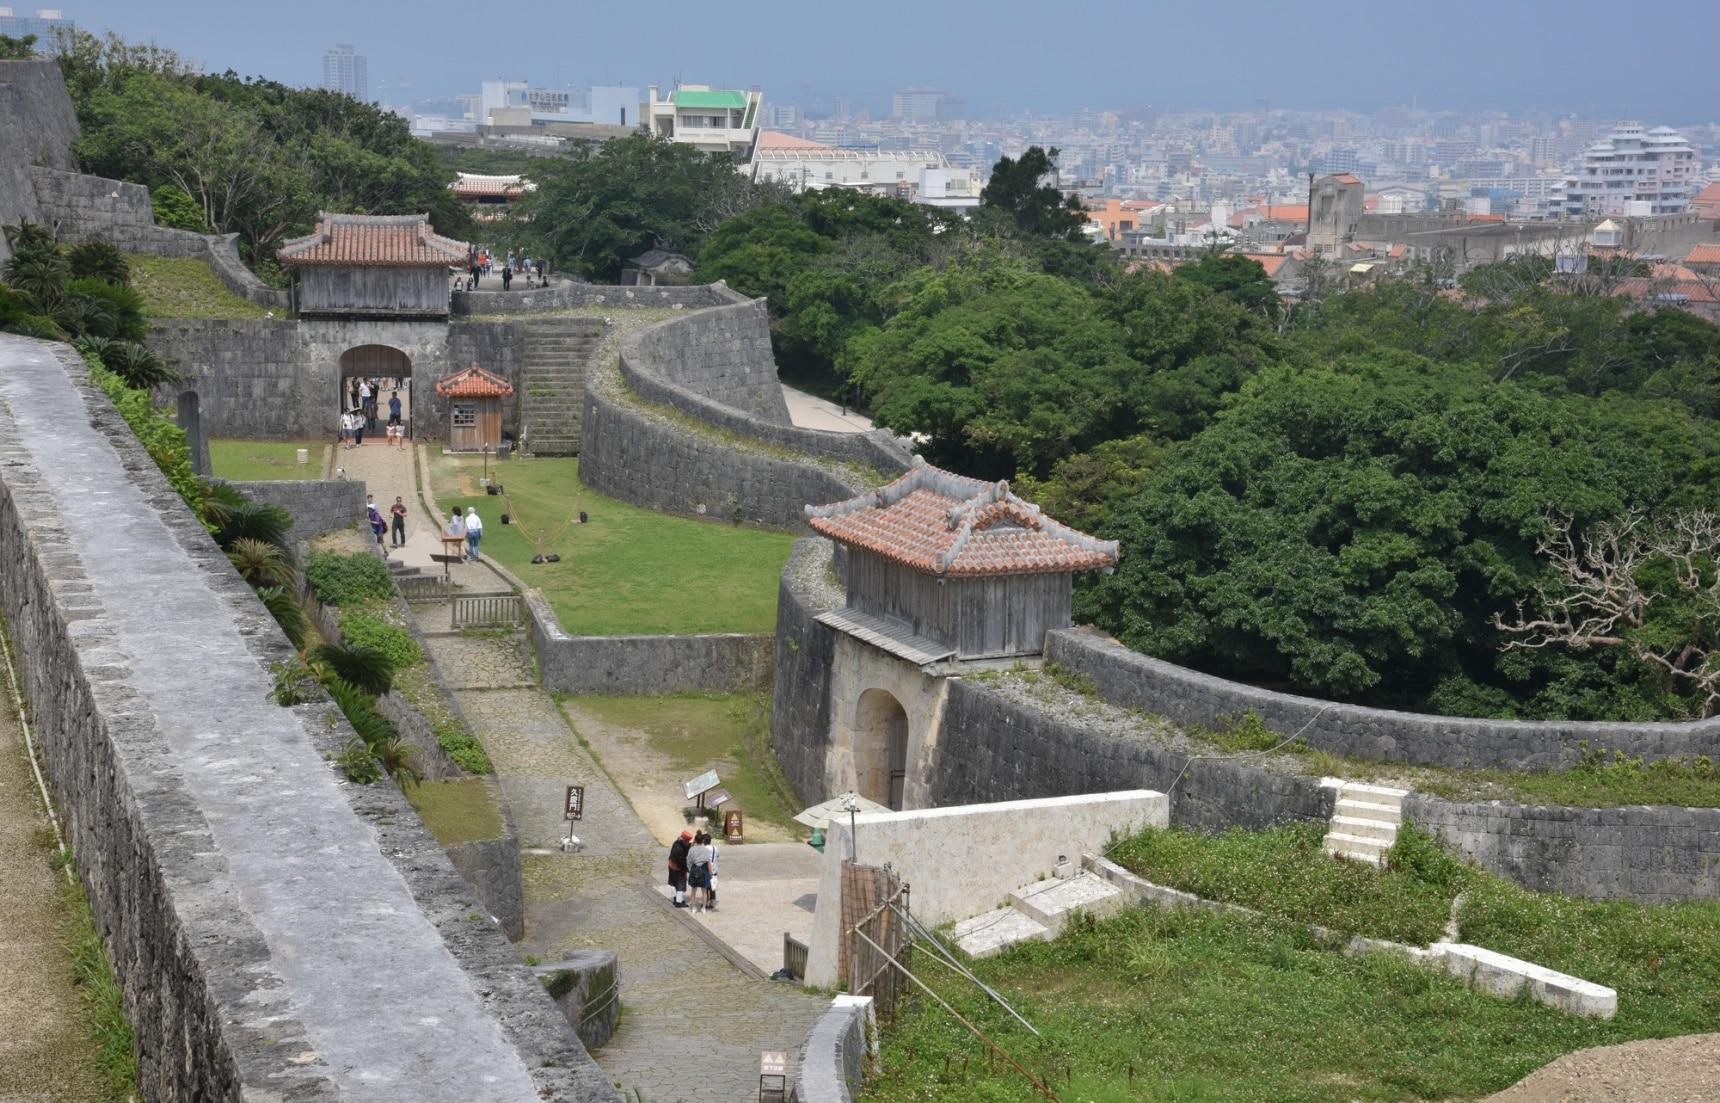 Itokazu Ruins | Okinawa, Okinawa japan, Sacred places |Okinawa Japan Ruins